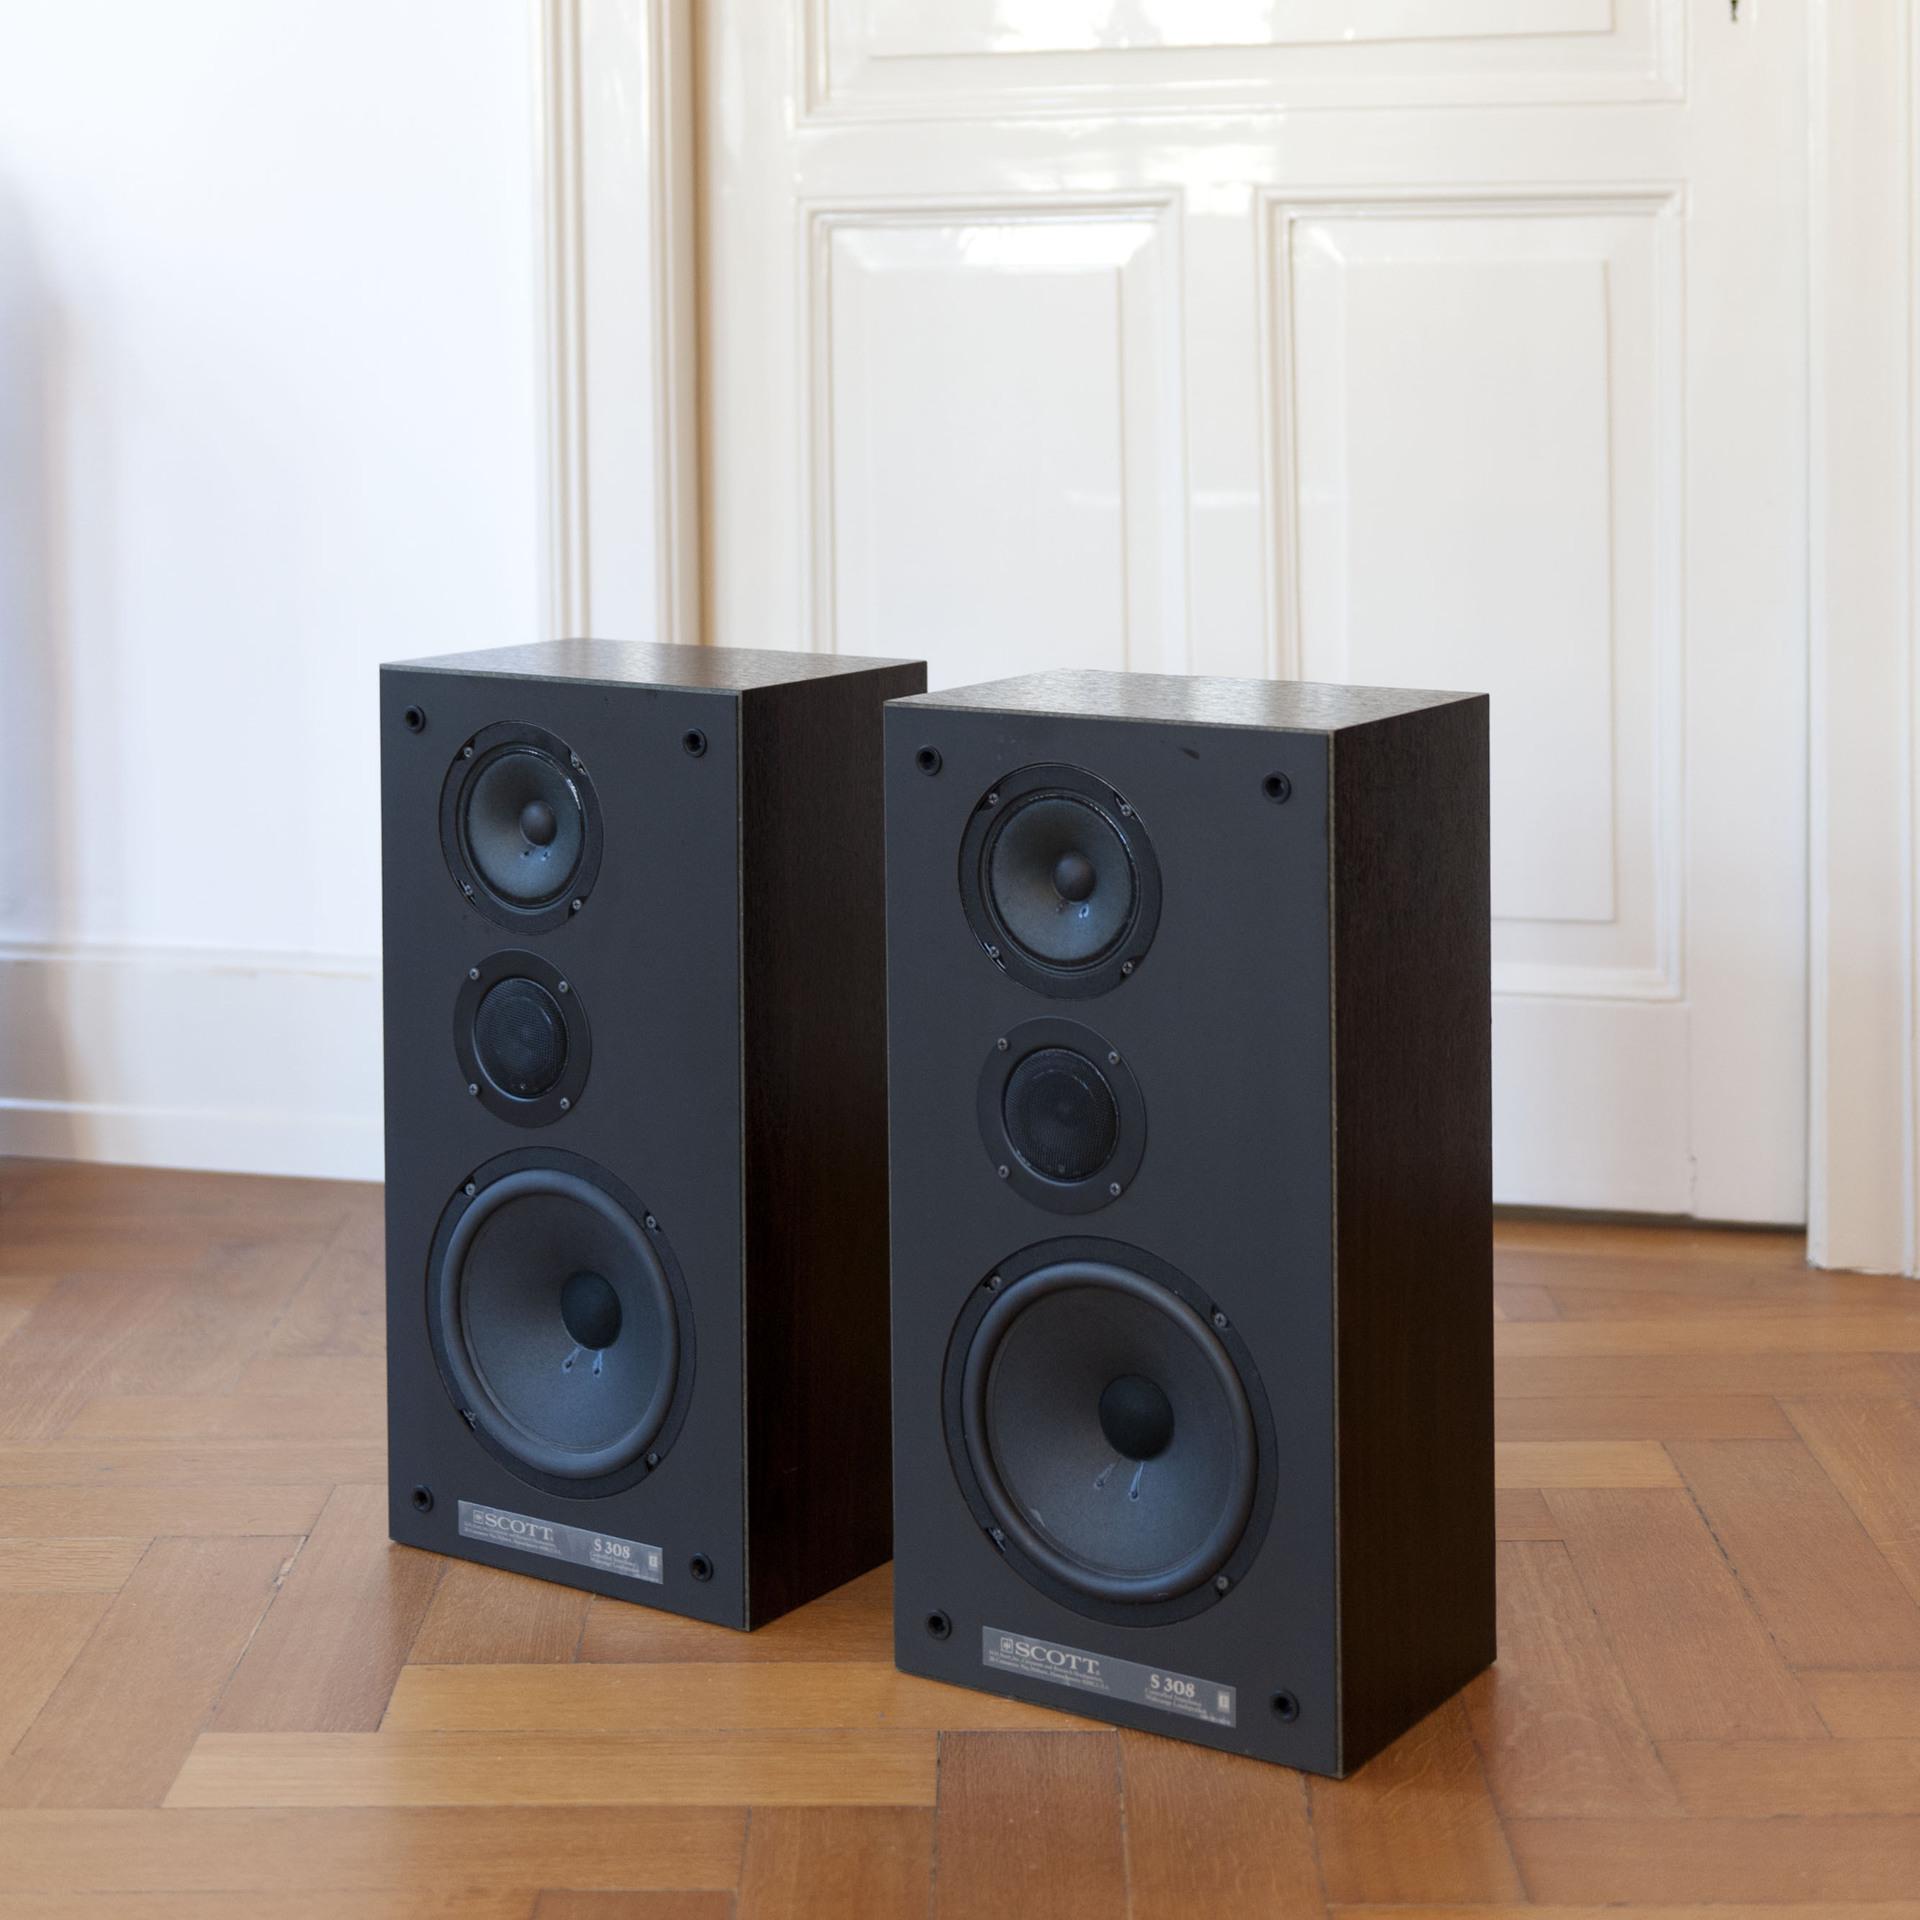 H.H. SCOTT HiFi Klassiker – The holy grail of vintage audio?!, Hifi ...